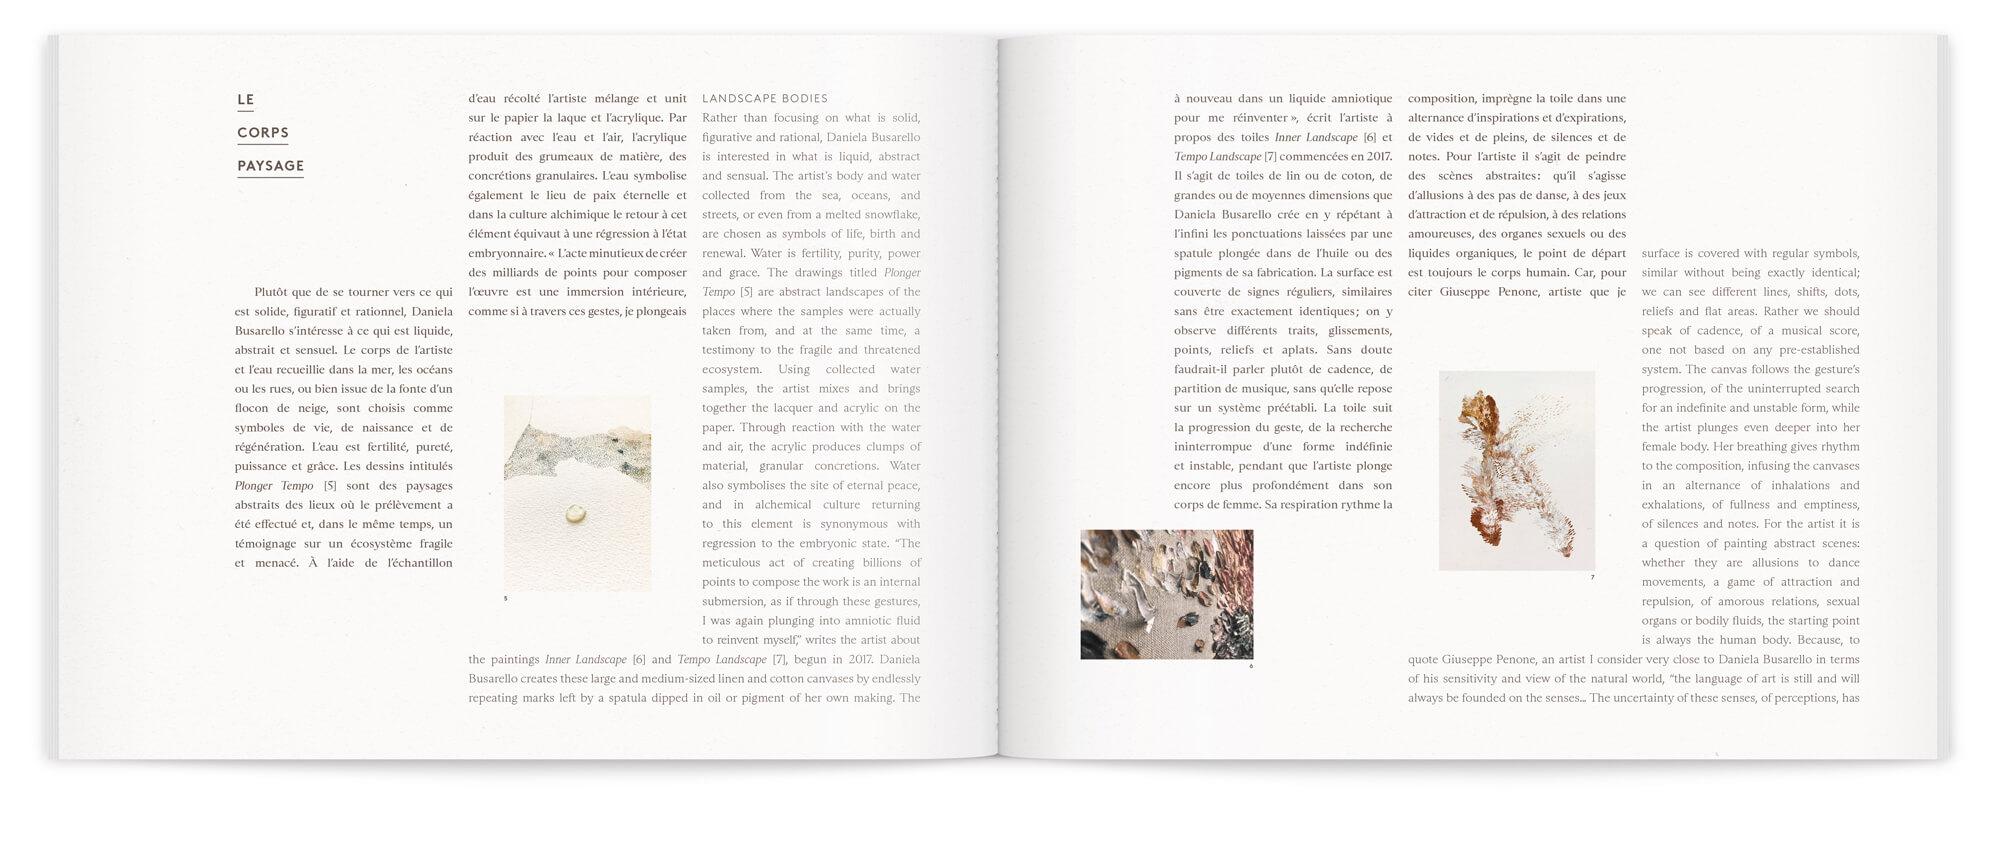 daniela-busarello-vida-livret-le-corps-paysage-ichetkar